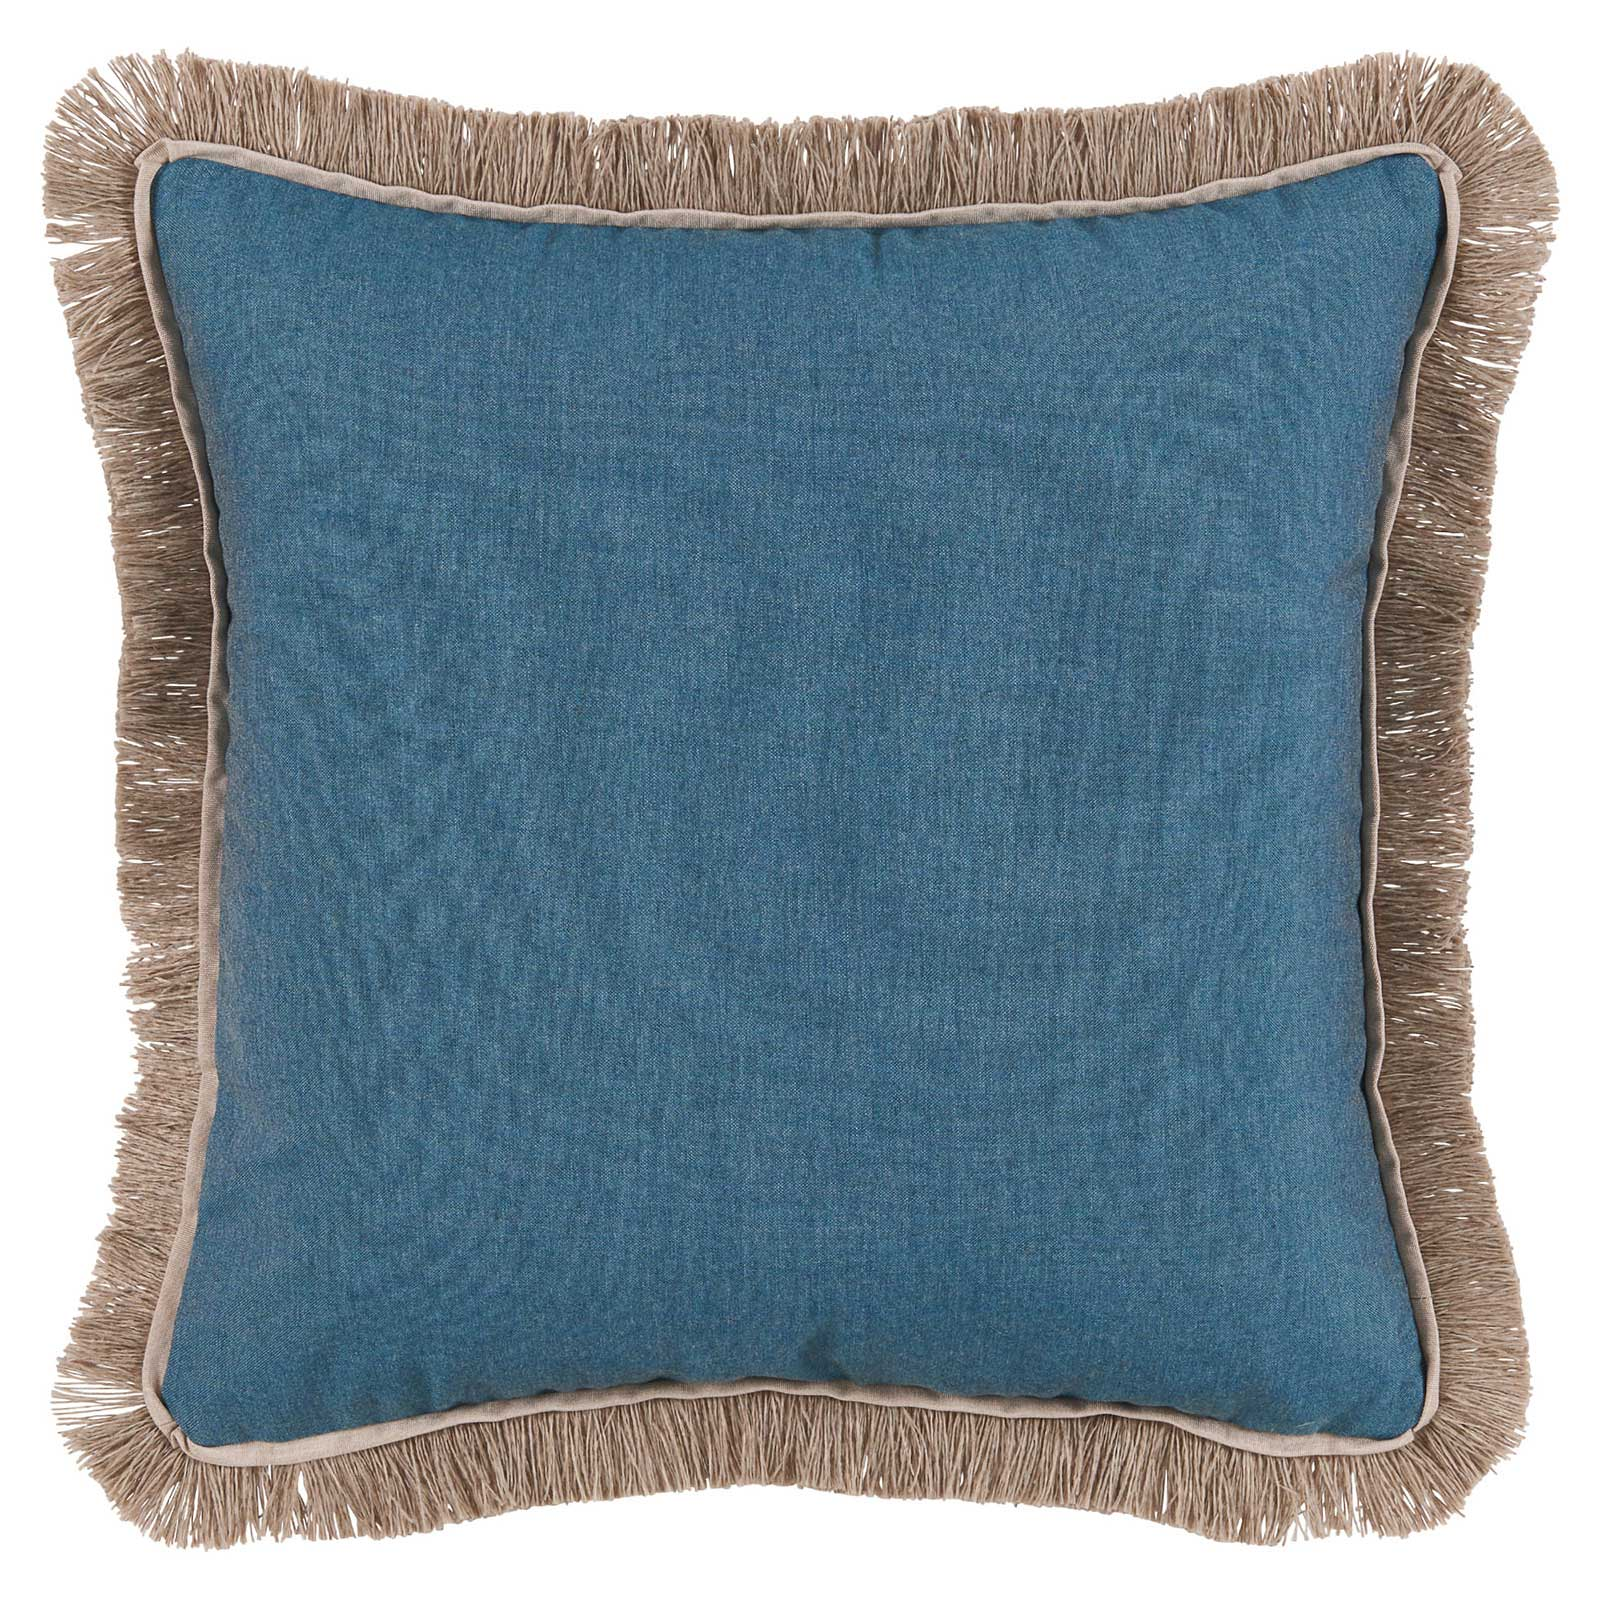 Talli Regency Fringe Denim Outdoor Pillow - 20x20